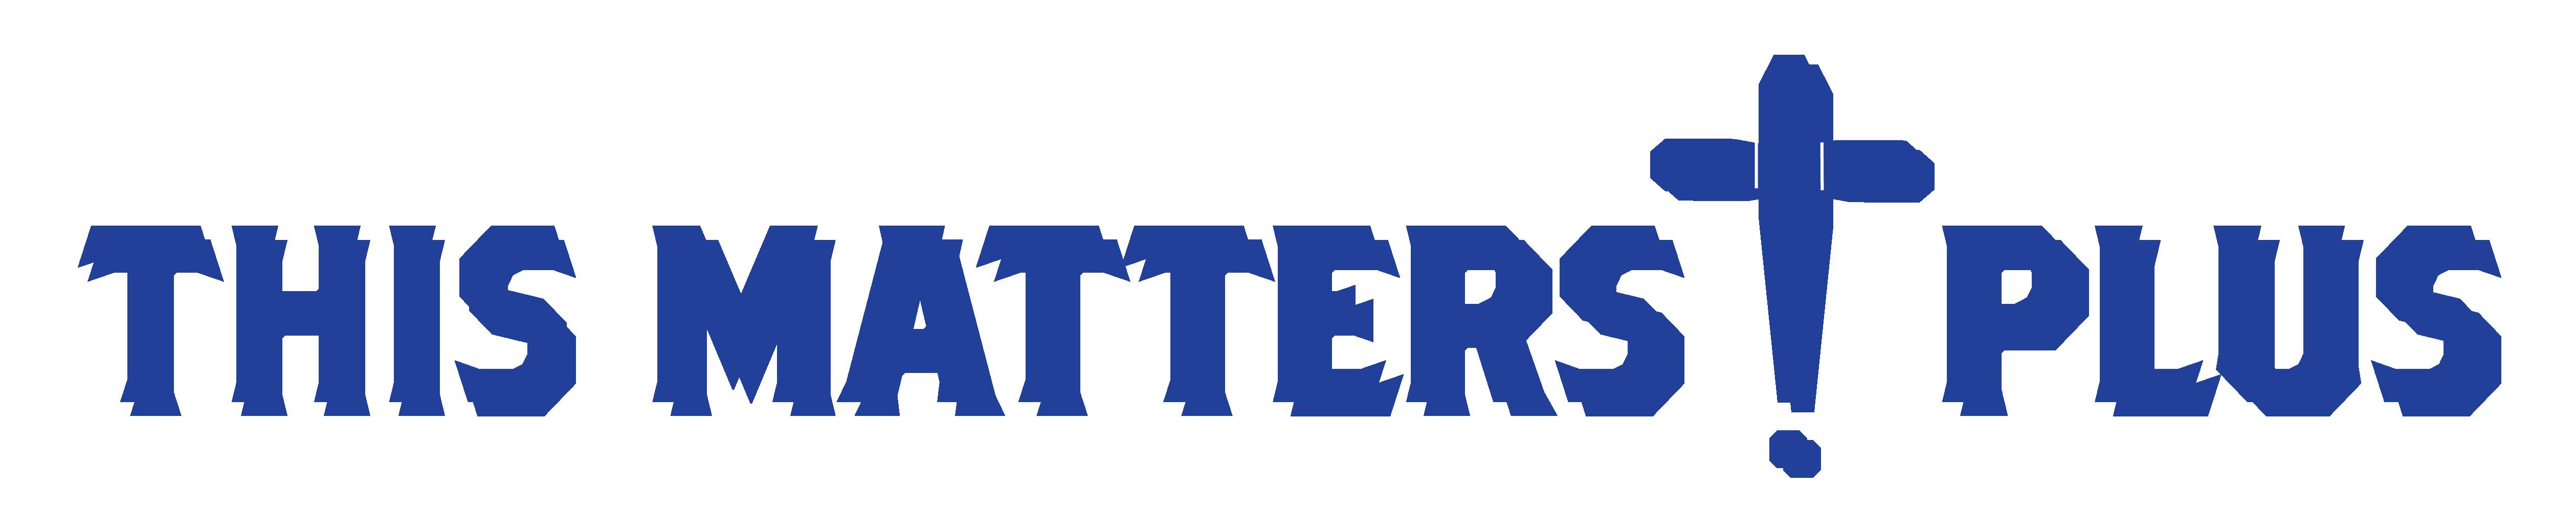 This Matters! Plus logo-01